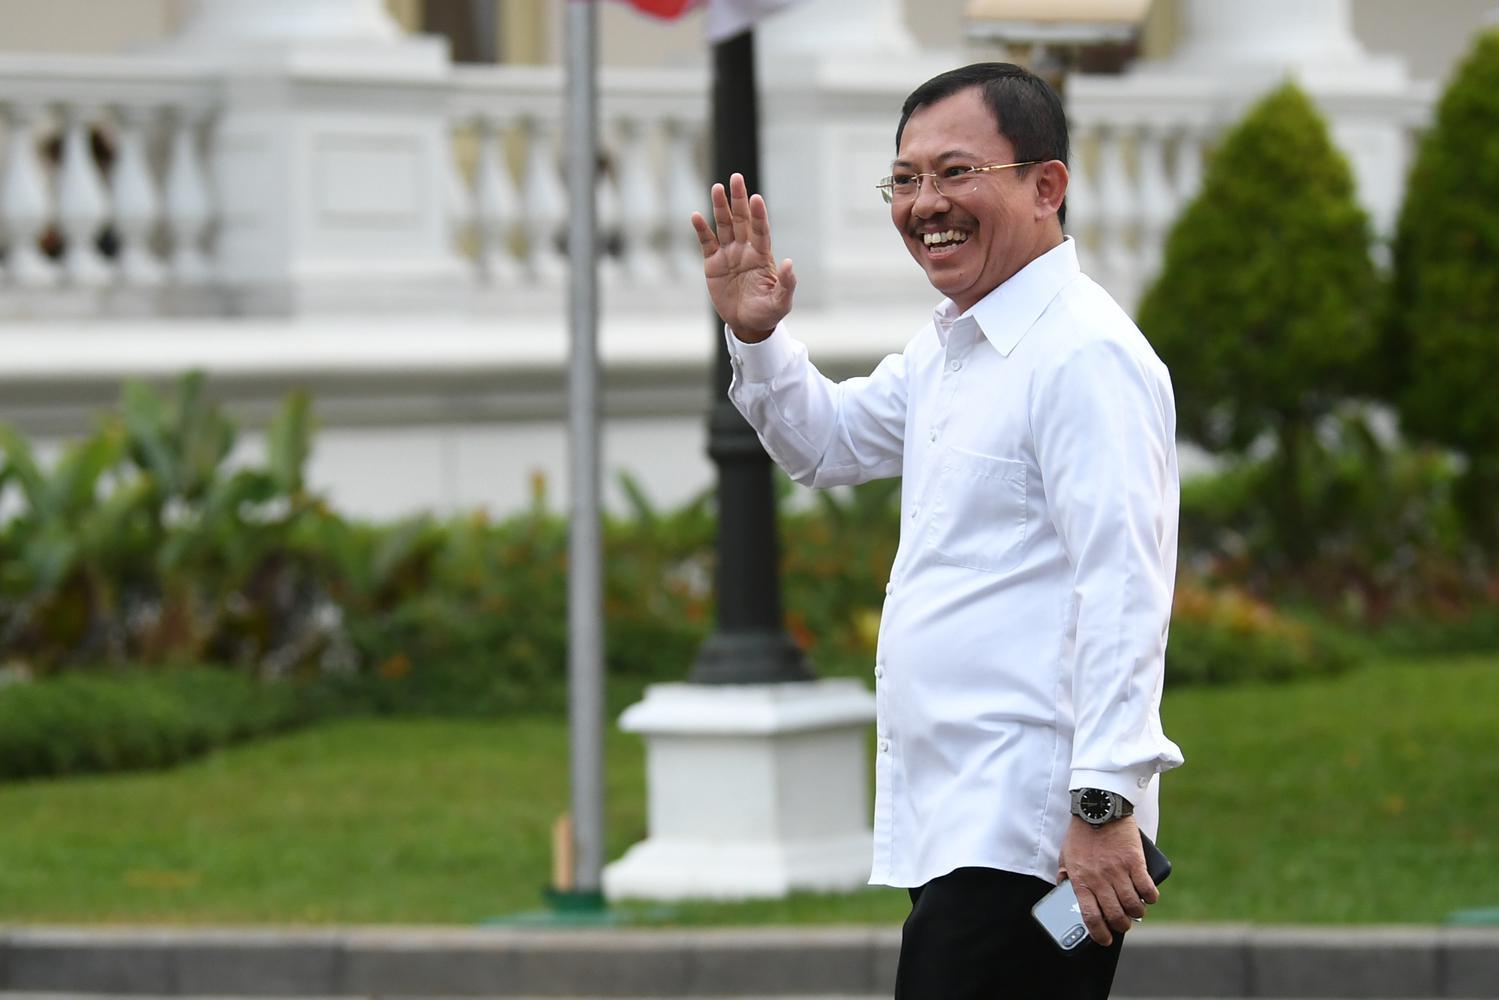 Dokter Terawan Agus Putranto, Menkes, Jokowi, BPJS